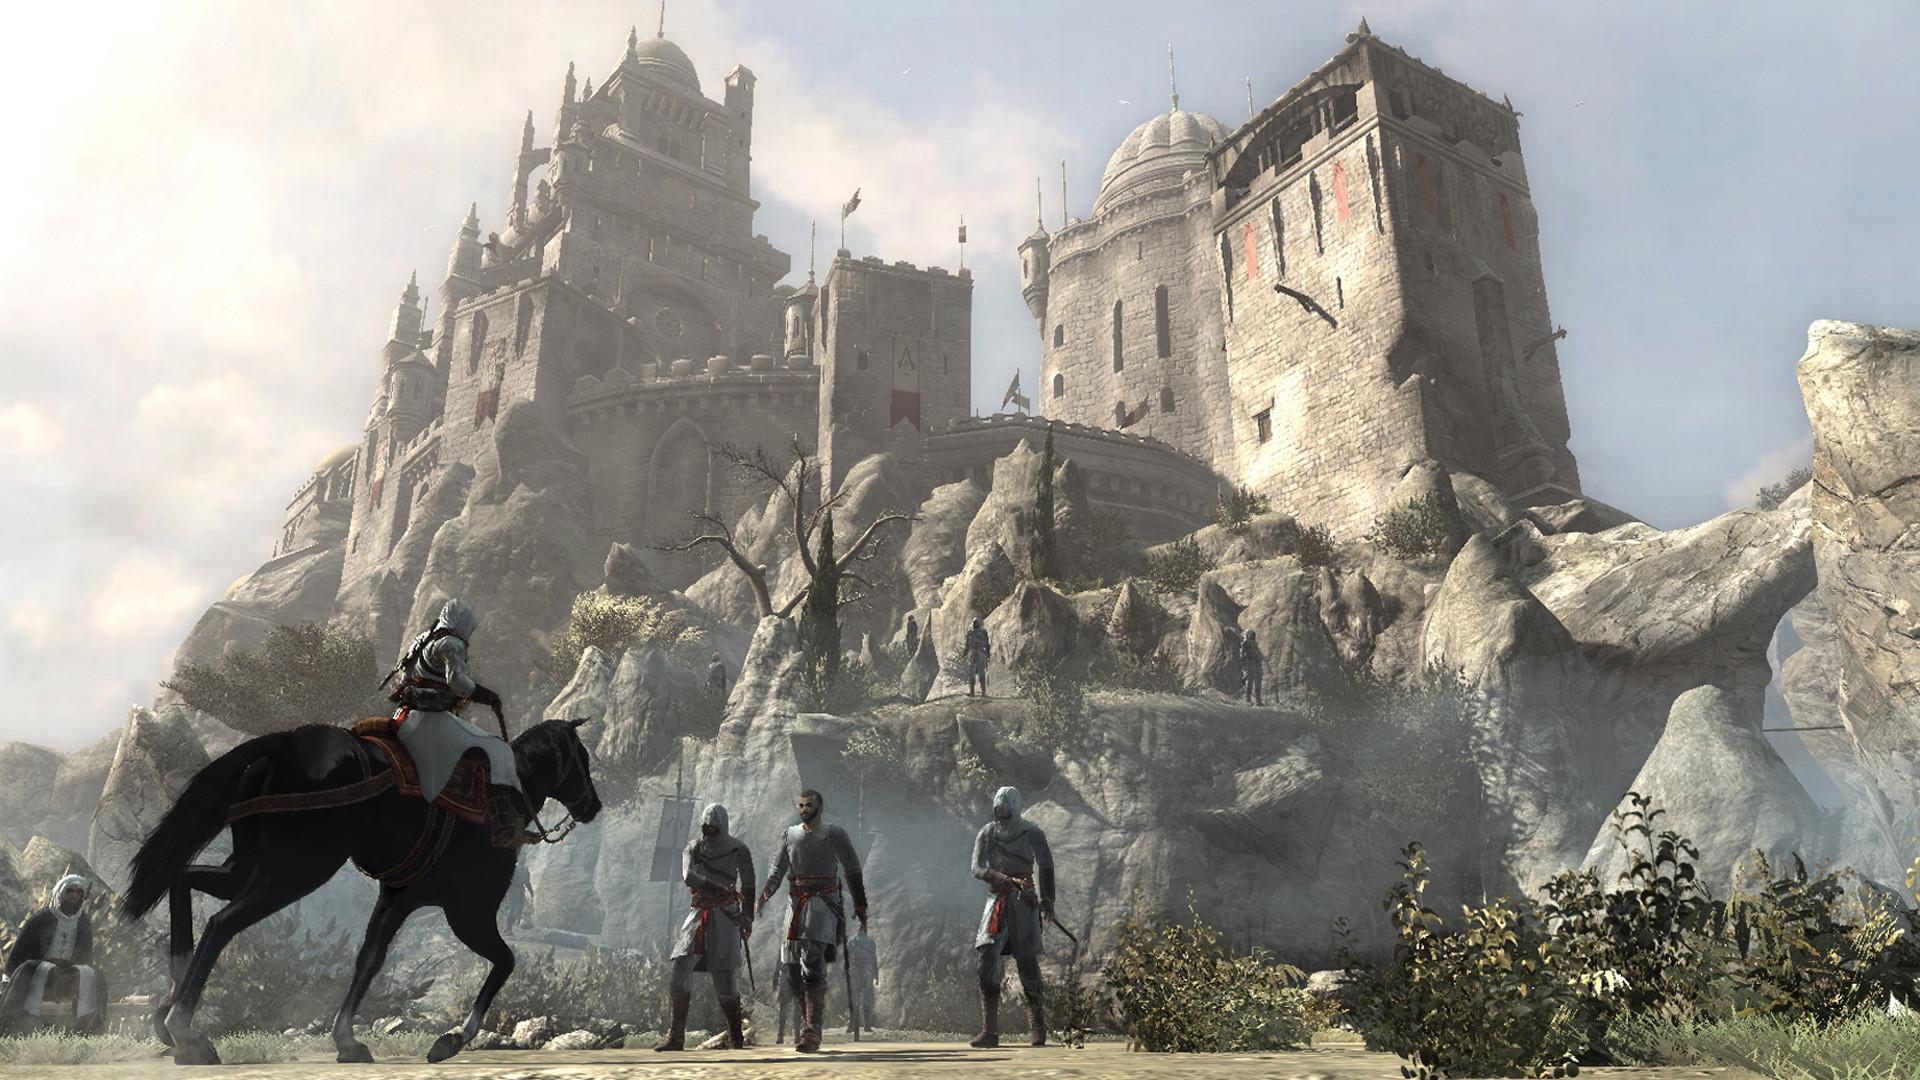 Assassins Creed Wallpapers HD Wallpaper | HD Wallpapers | Pinterest | Assassins  creed, Hd wallpaper and Wallpaper